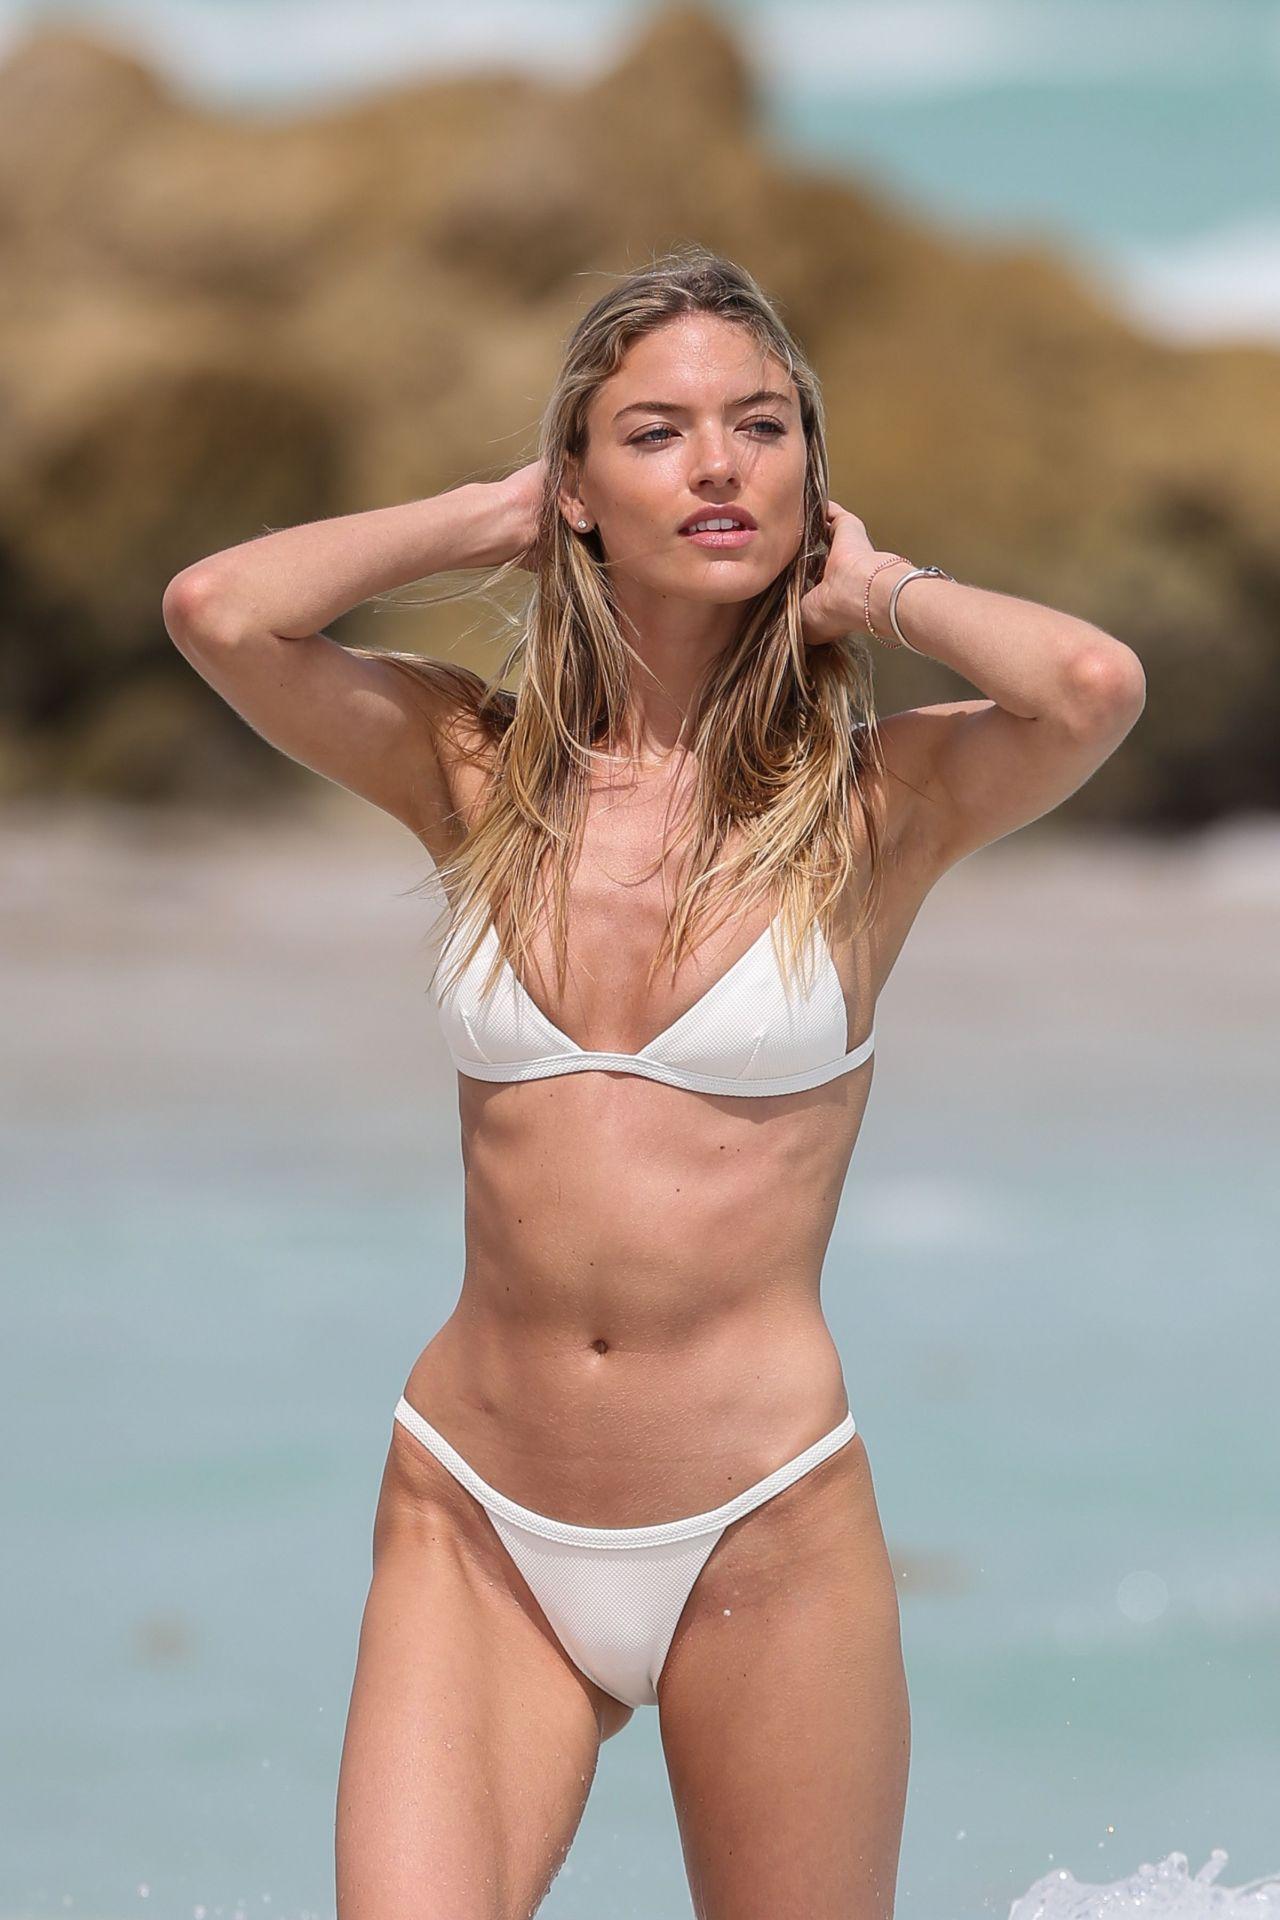 white bikini beach pron pictures - disneydiscount